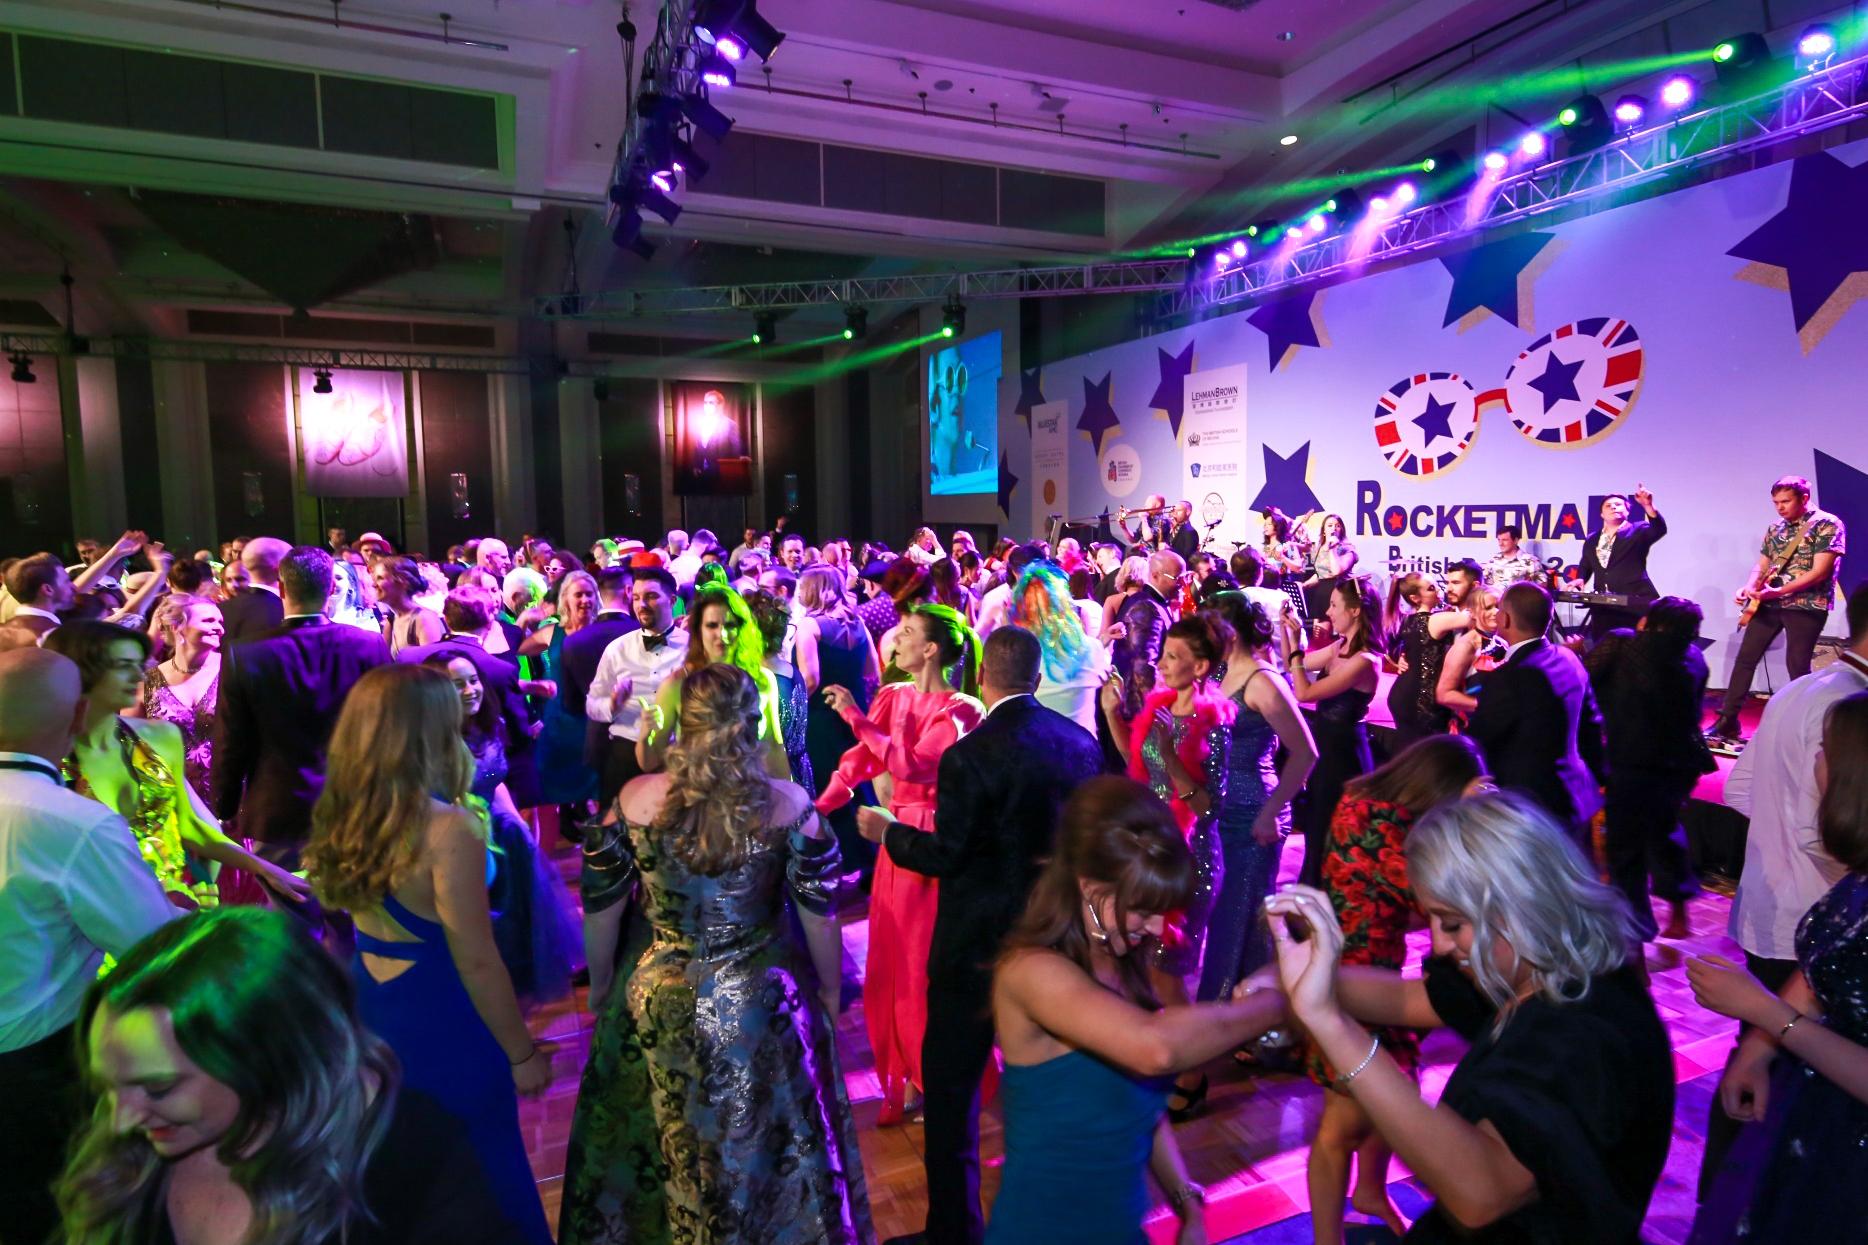 British Ball 2020 guests dancing